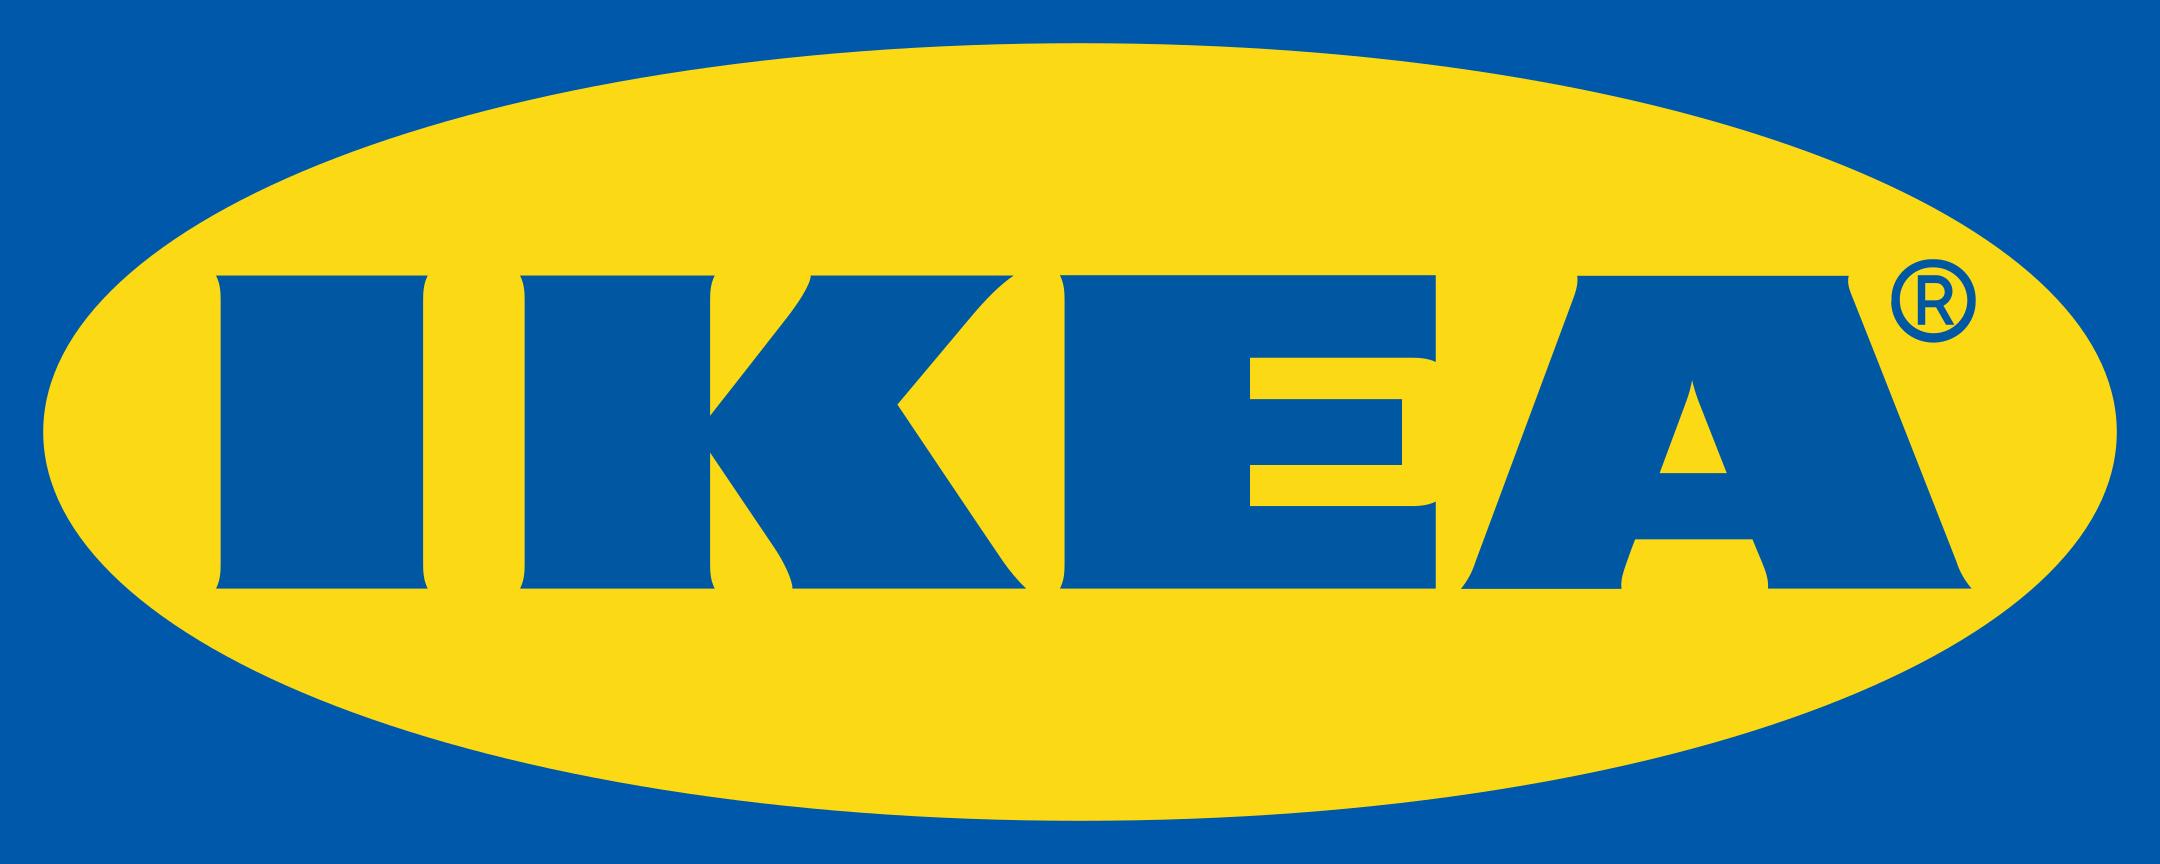 ikea logo 1 2 - IKEA Logo